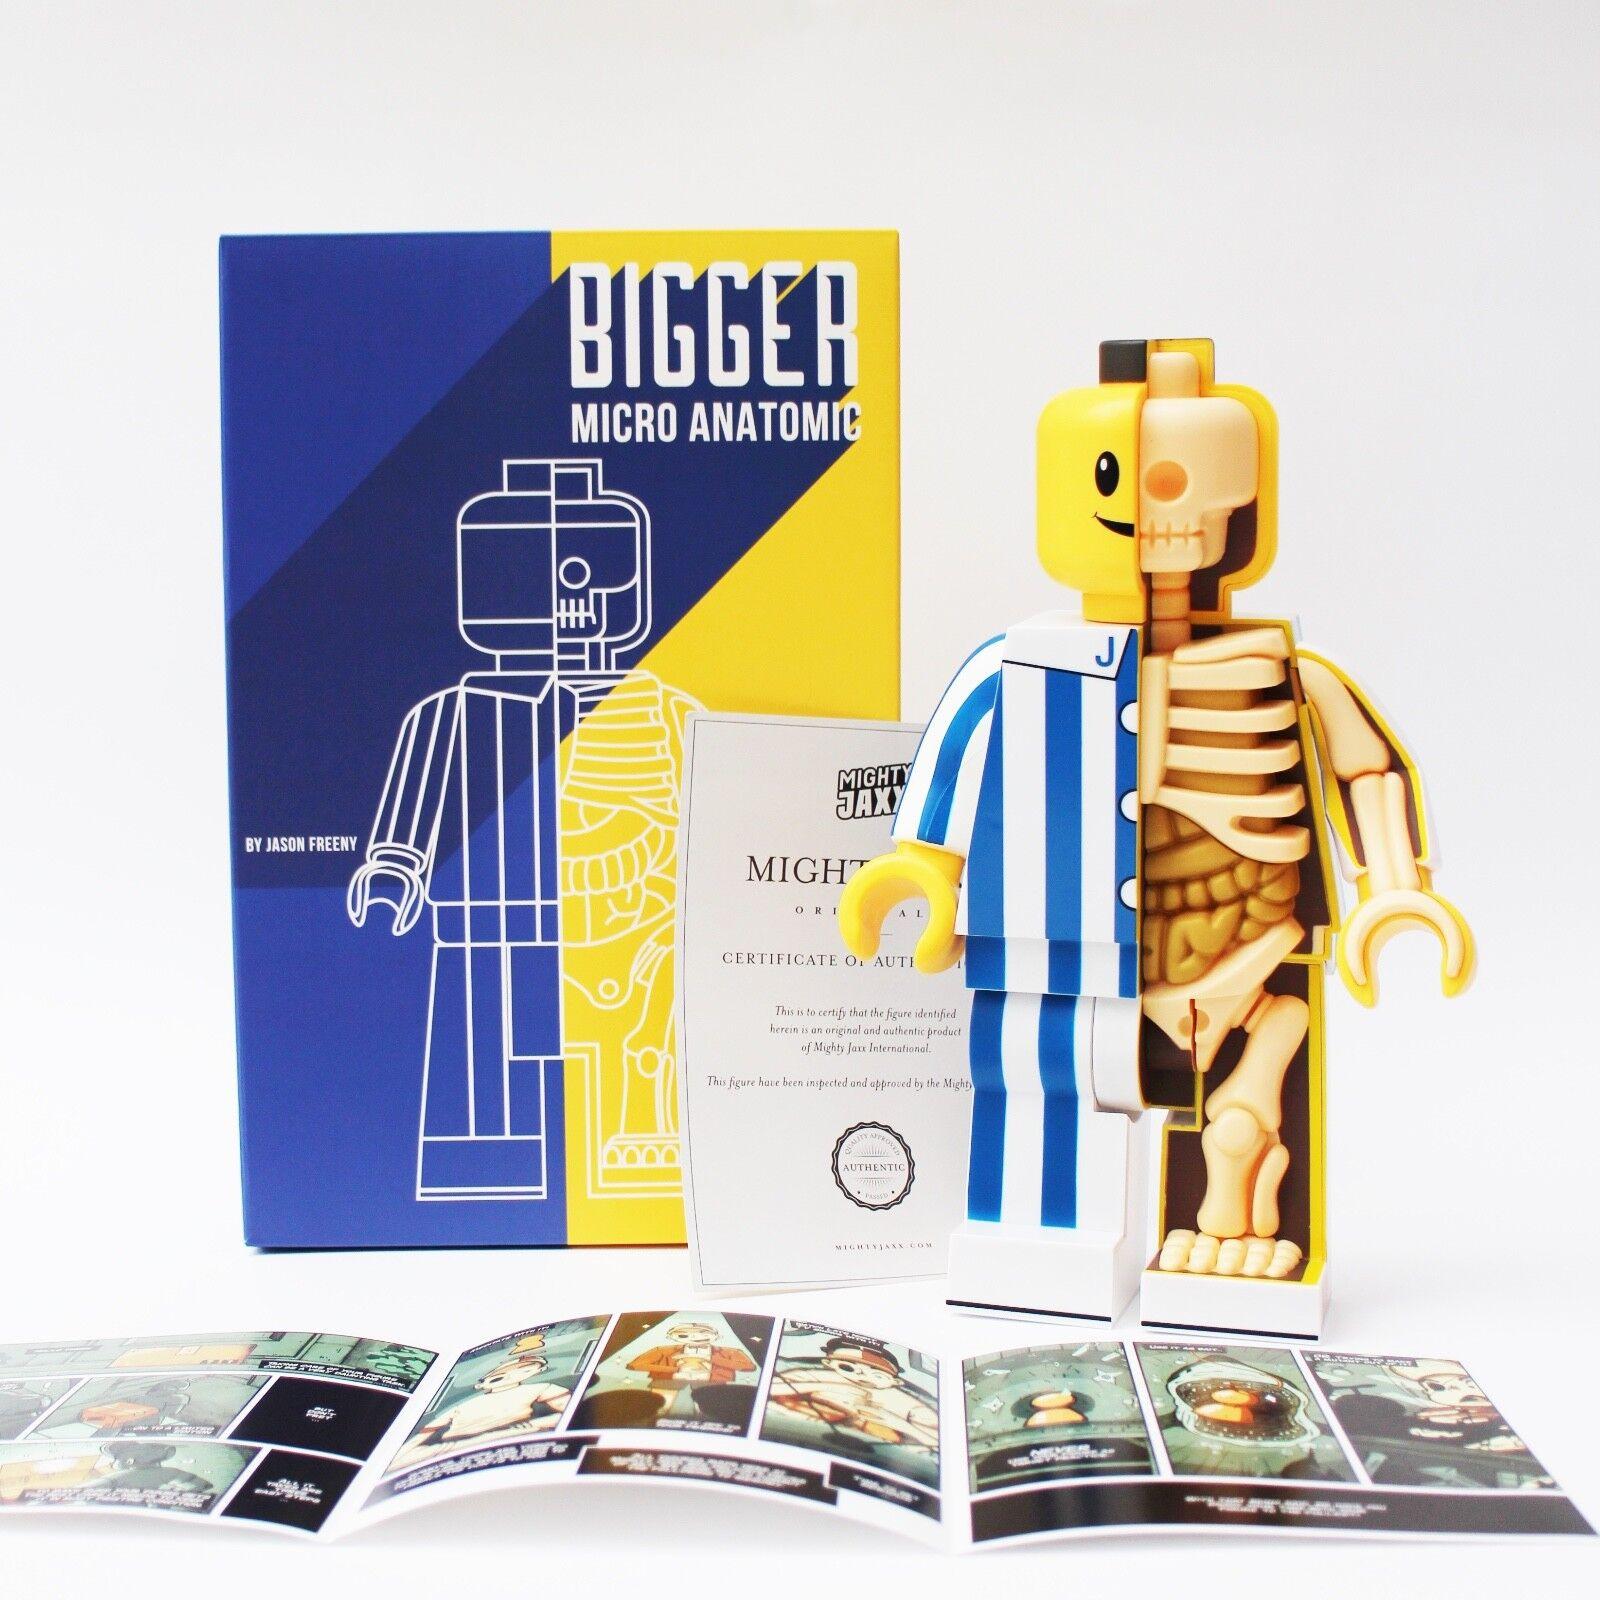 Bigger Micro Schematic by Jason Freeny (Mighty Jaxx, Overjoyed Edition)